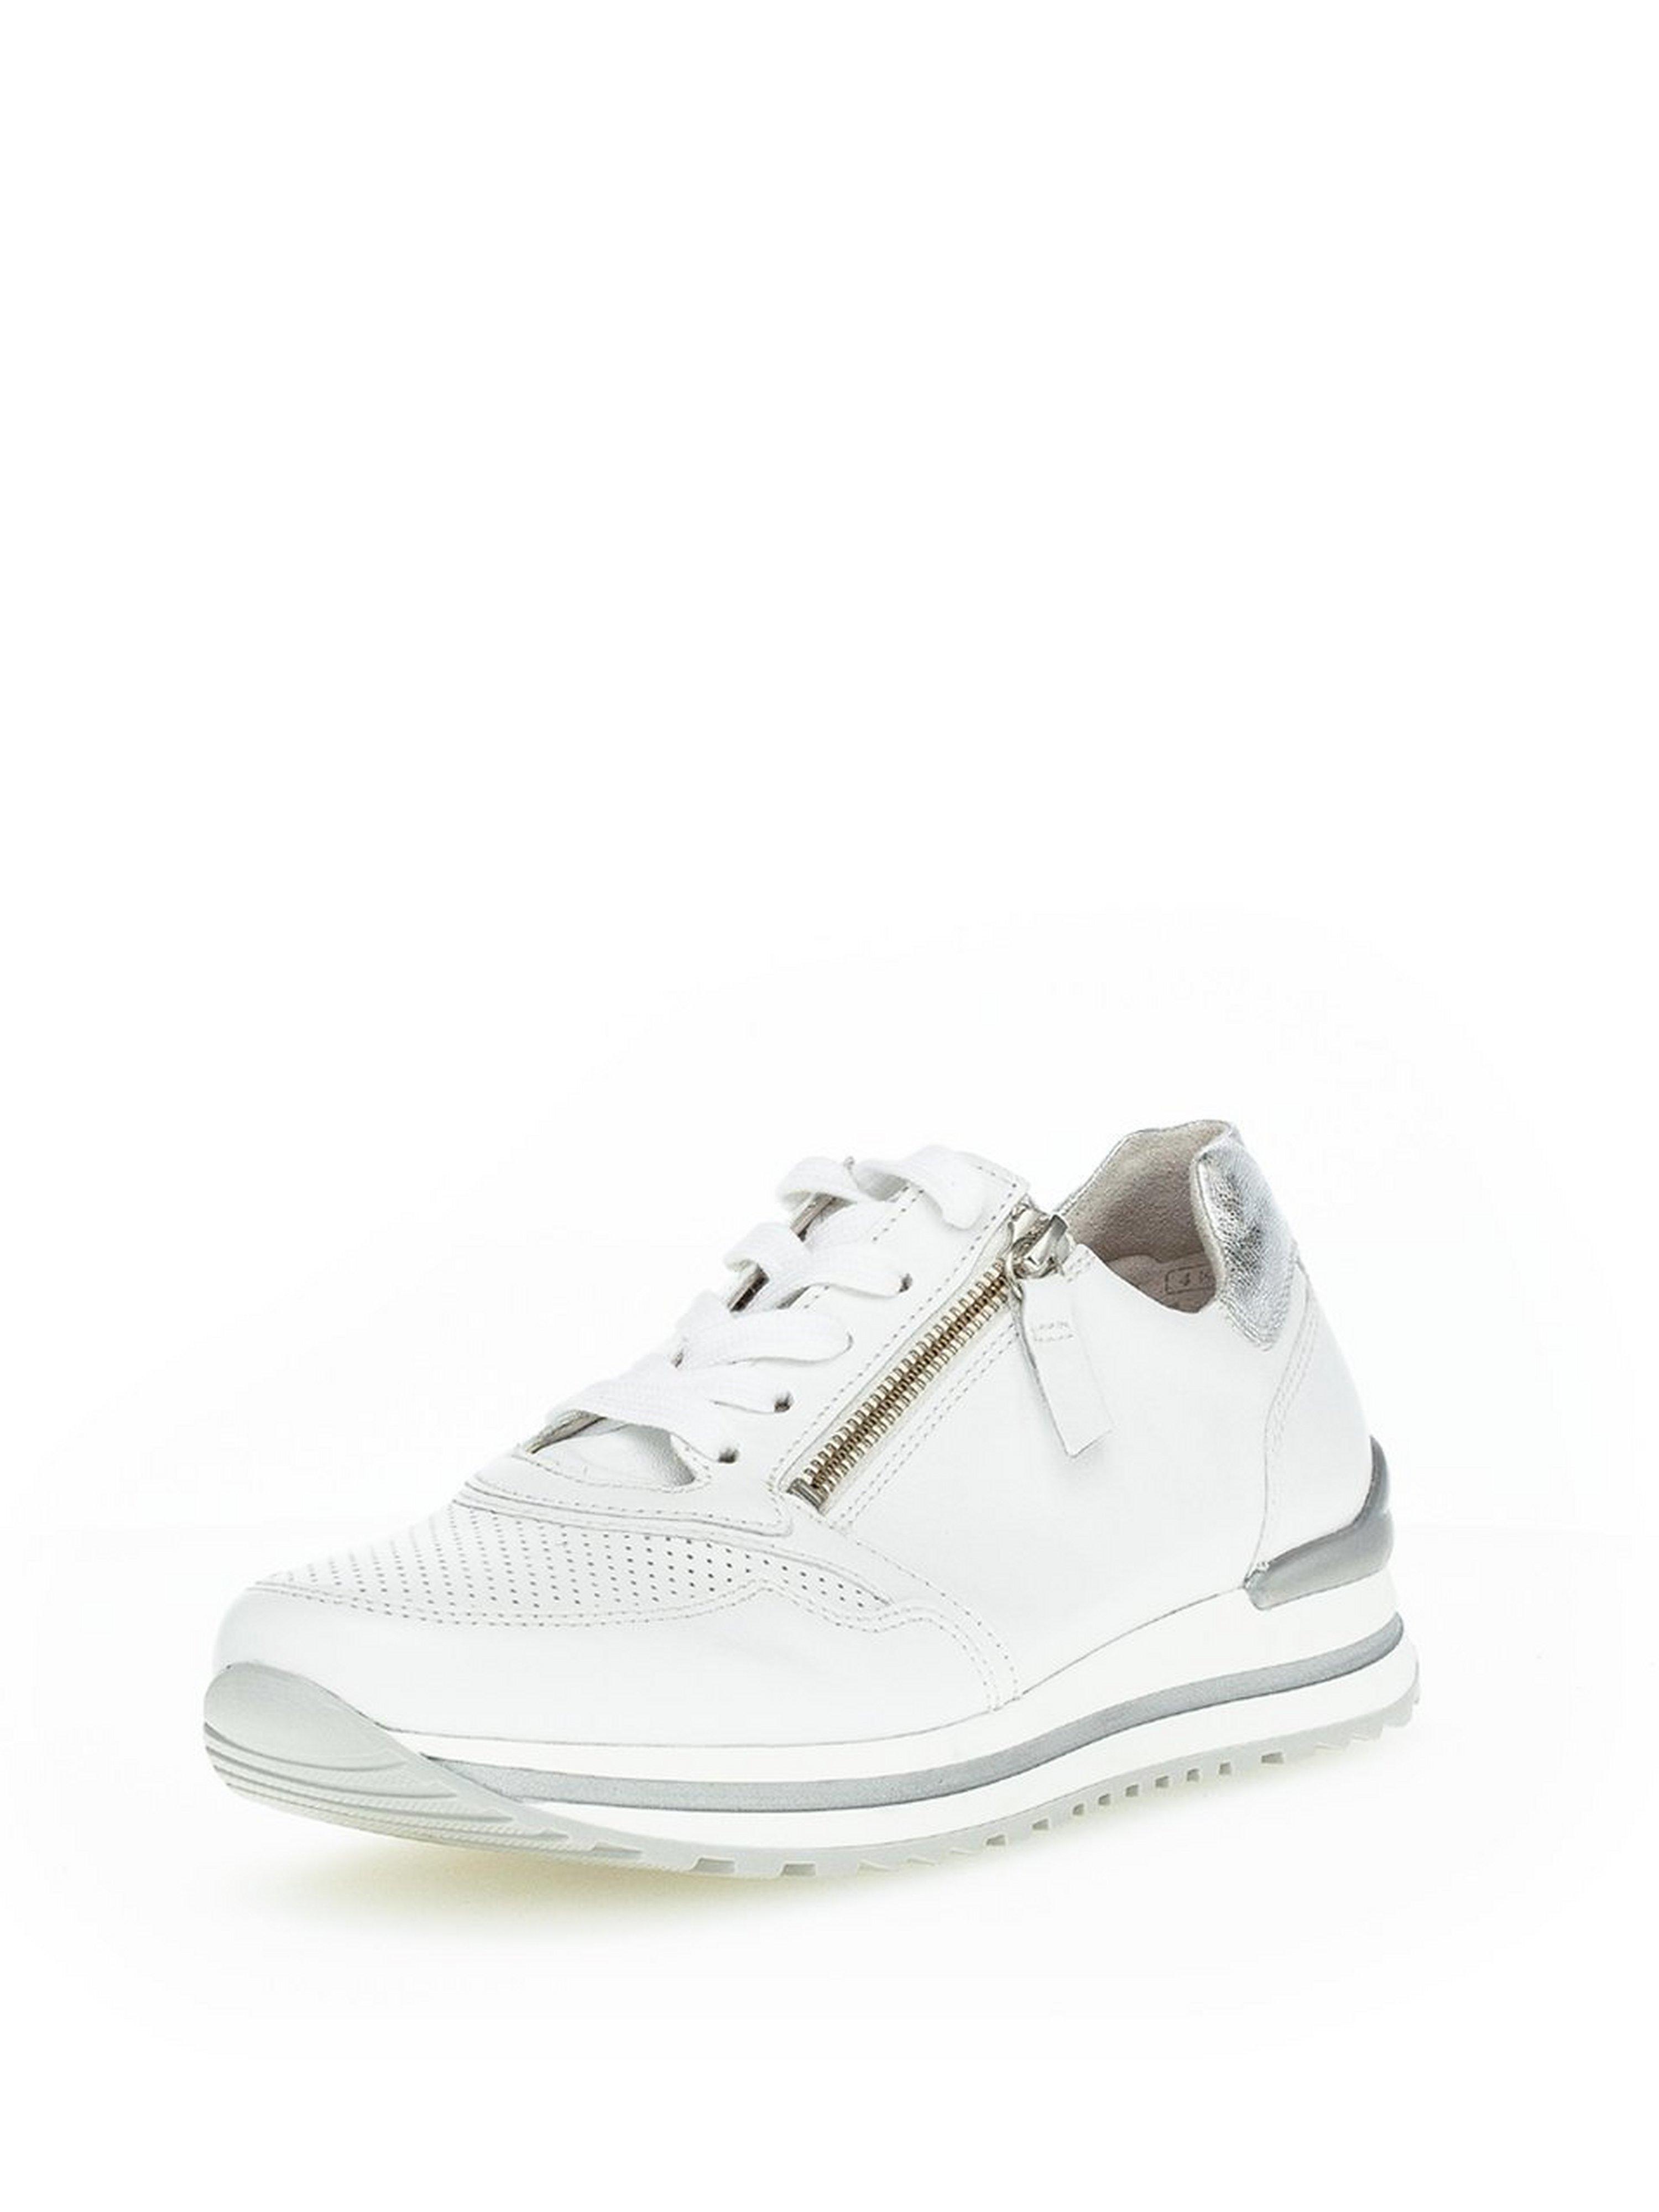 Soft kidskin suede sneakers Gabor Comfort white